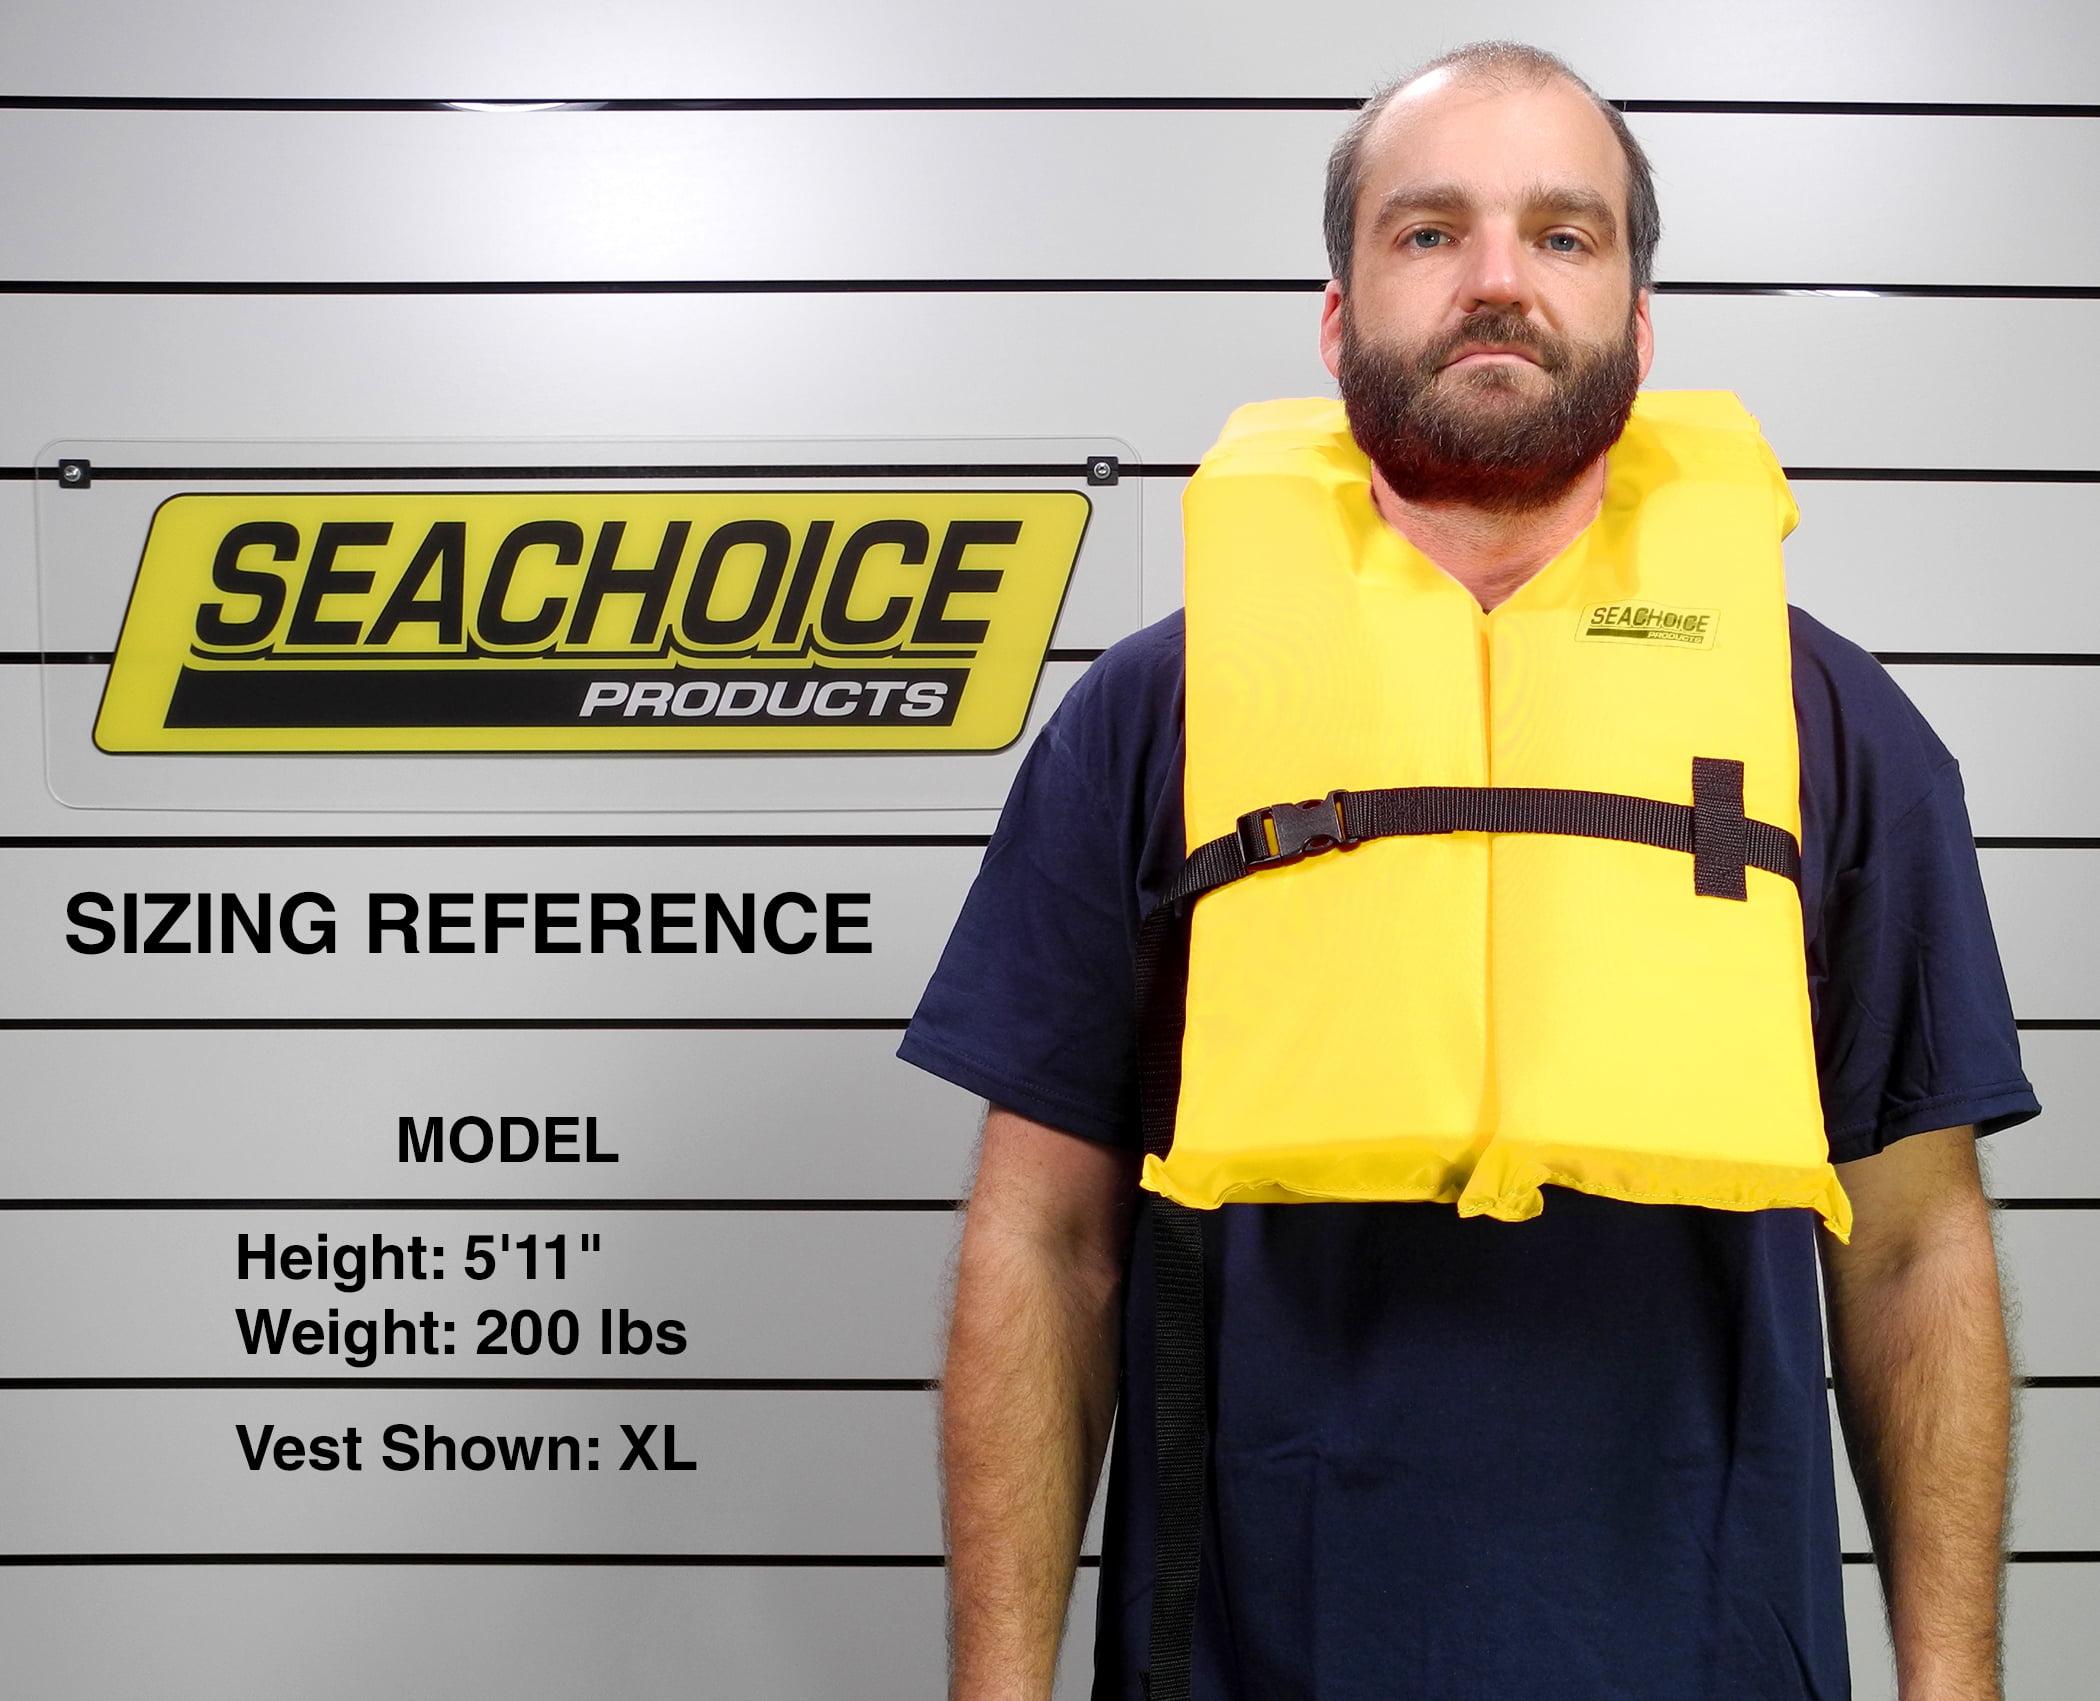 Seachoice 86080 Adult XL Life Vest Yellow for sale online